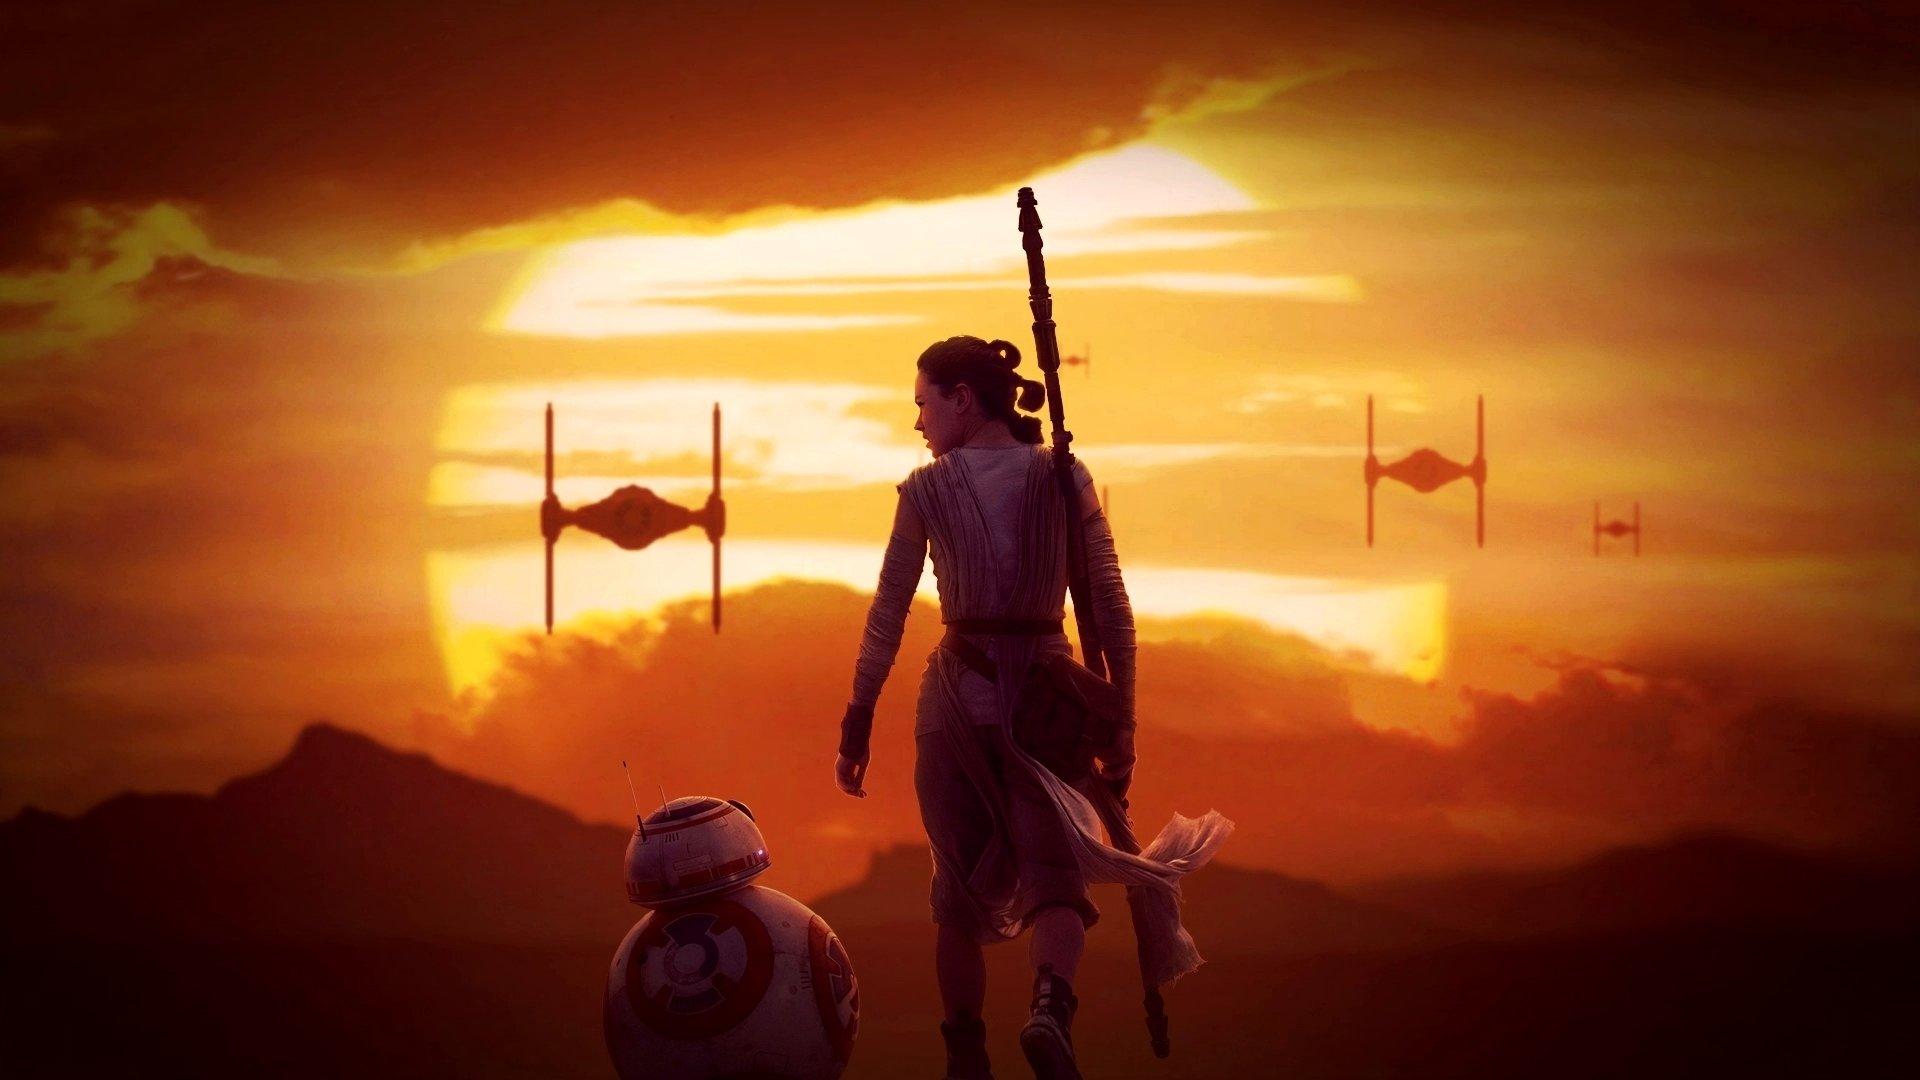 Star Wars Force Awakens 1080p: Rey (Star Wars) Wallpapers 1920x1080 Full HD (1080p